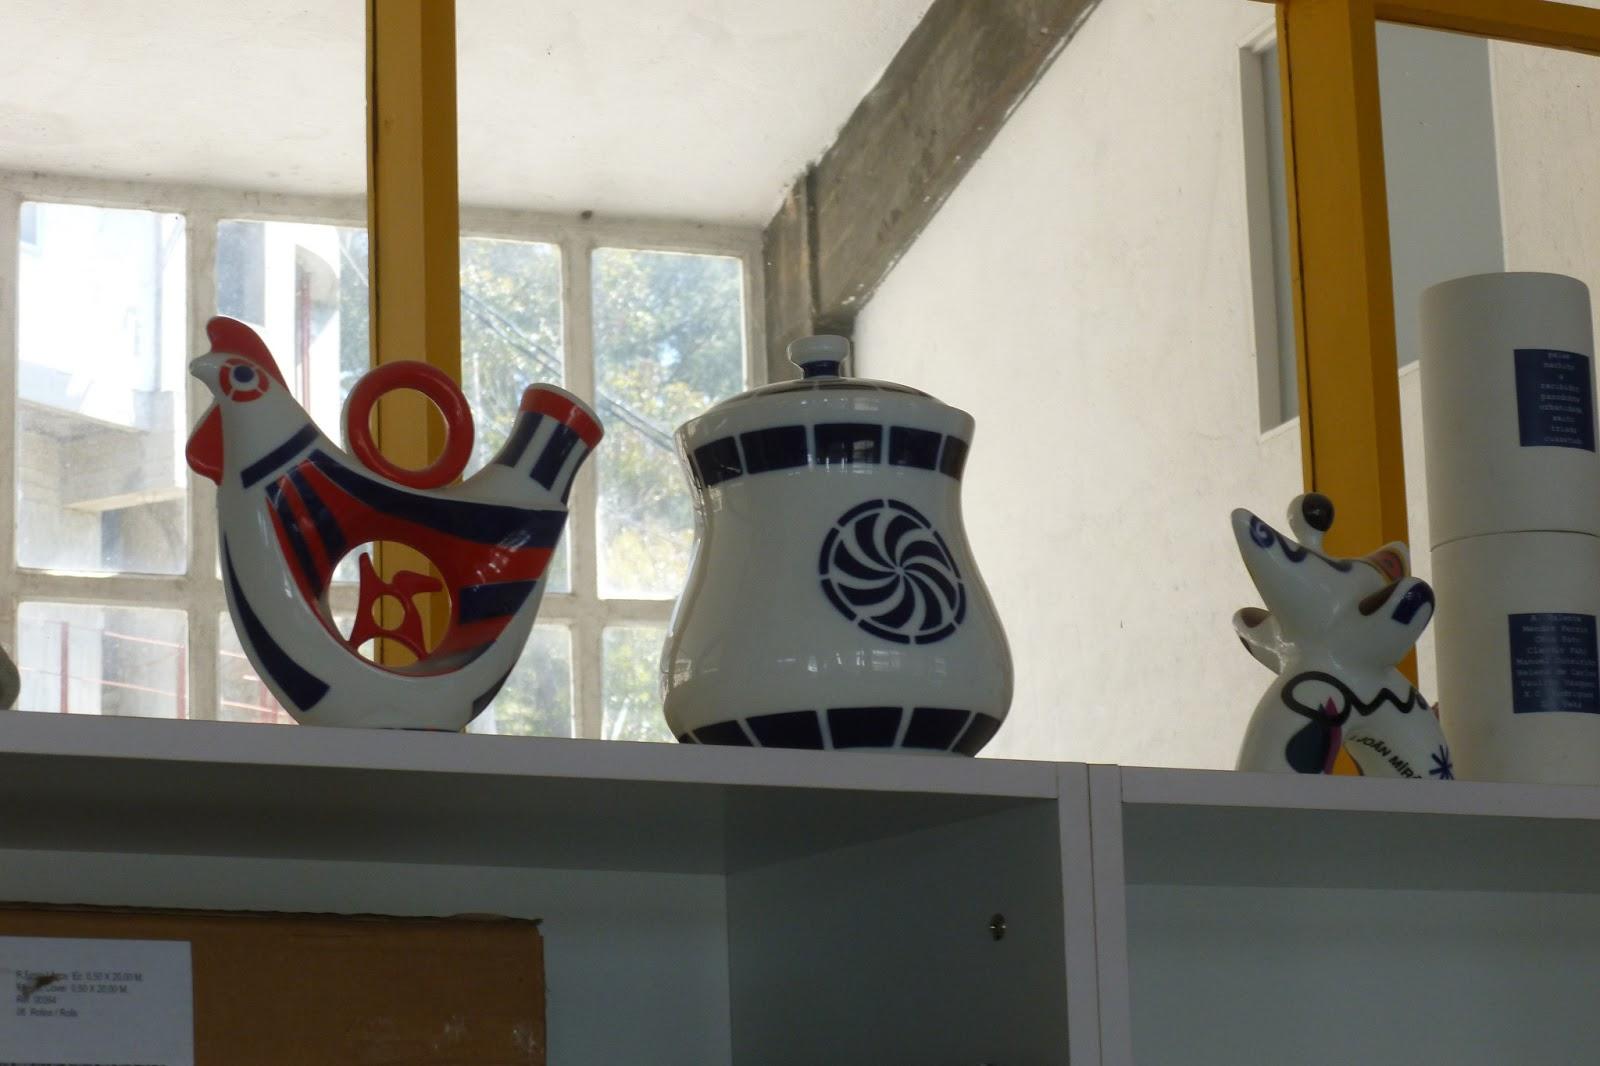 Ardura pictures projects finalizaci n del m dulo de for Fabrica de ceramica